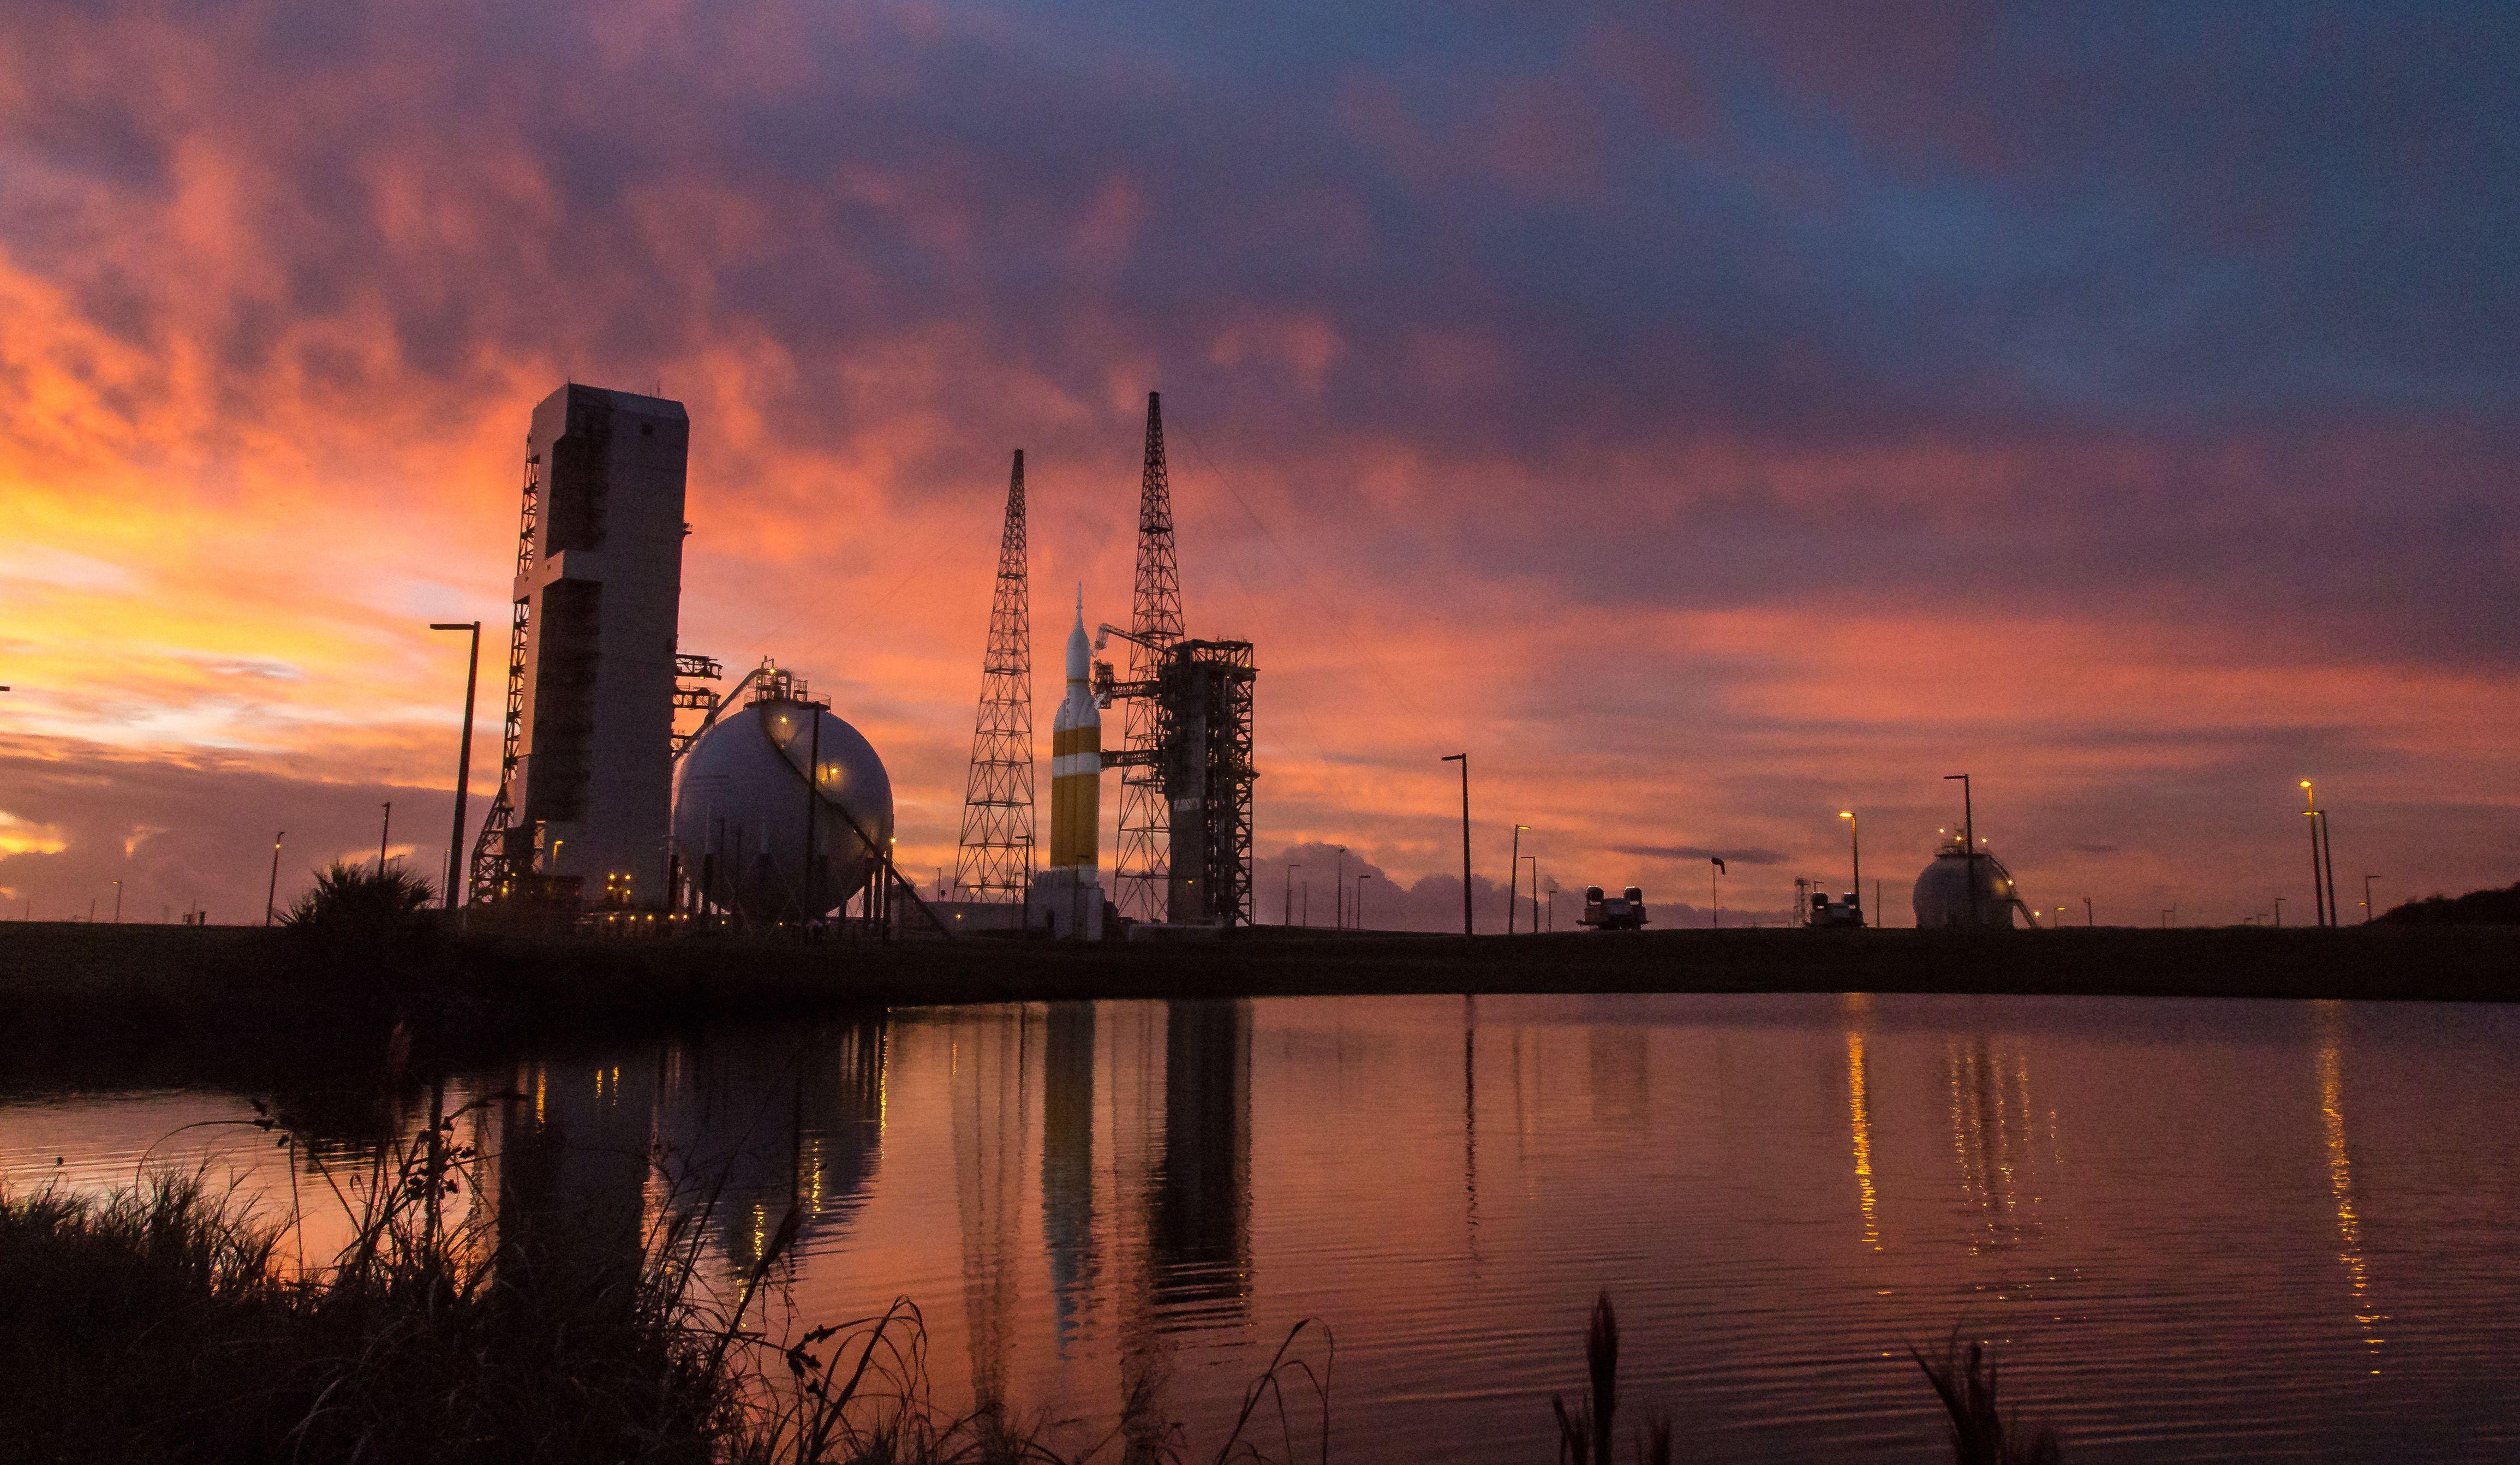 NASA Orion Rocket